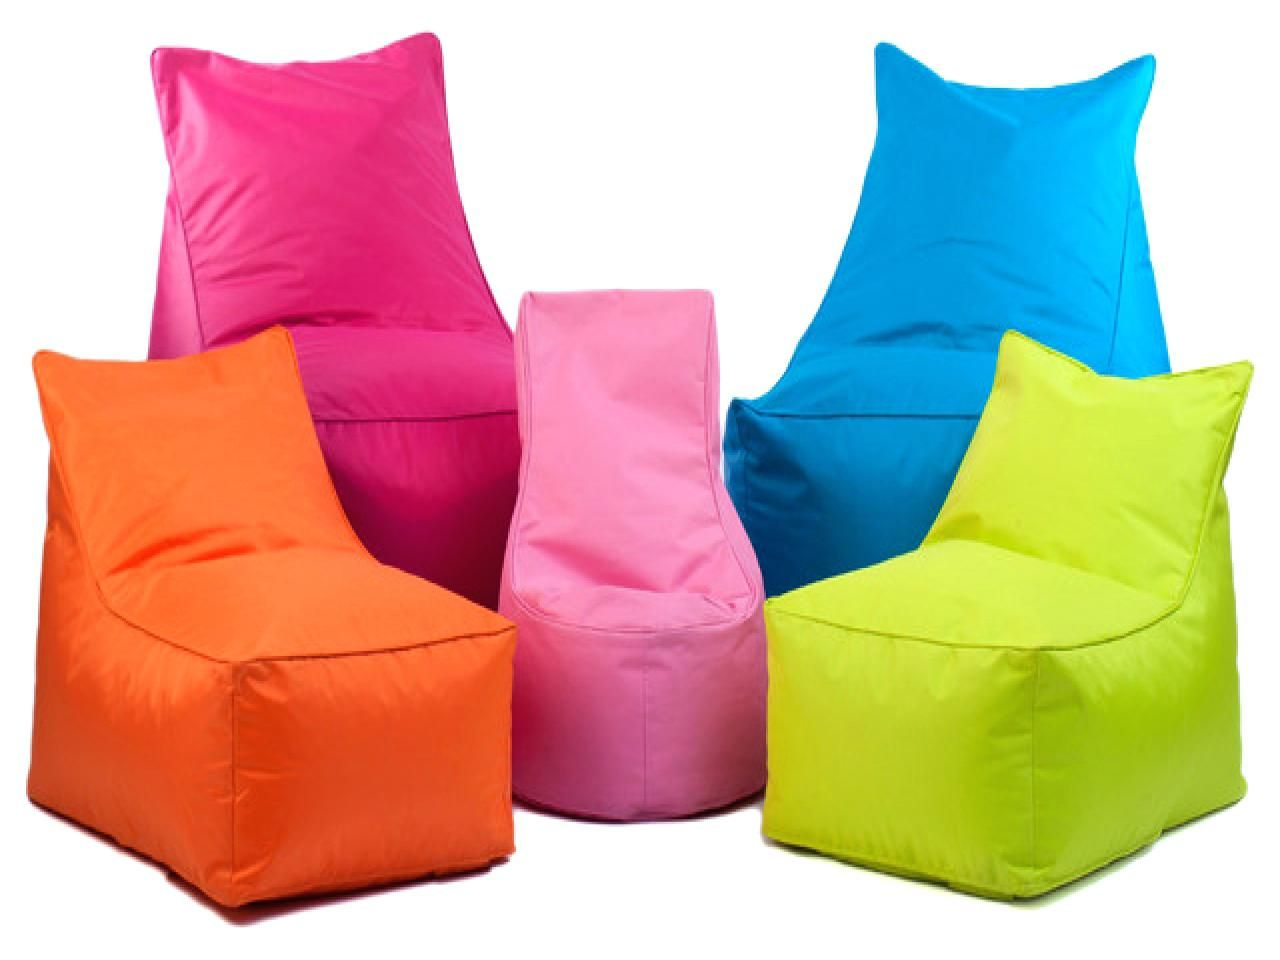 bean bag chairs for kids ikea ergonomic chair ireland ideas leather big joe dorm